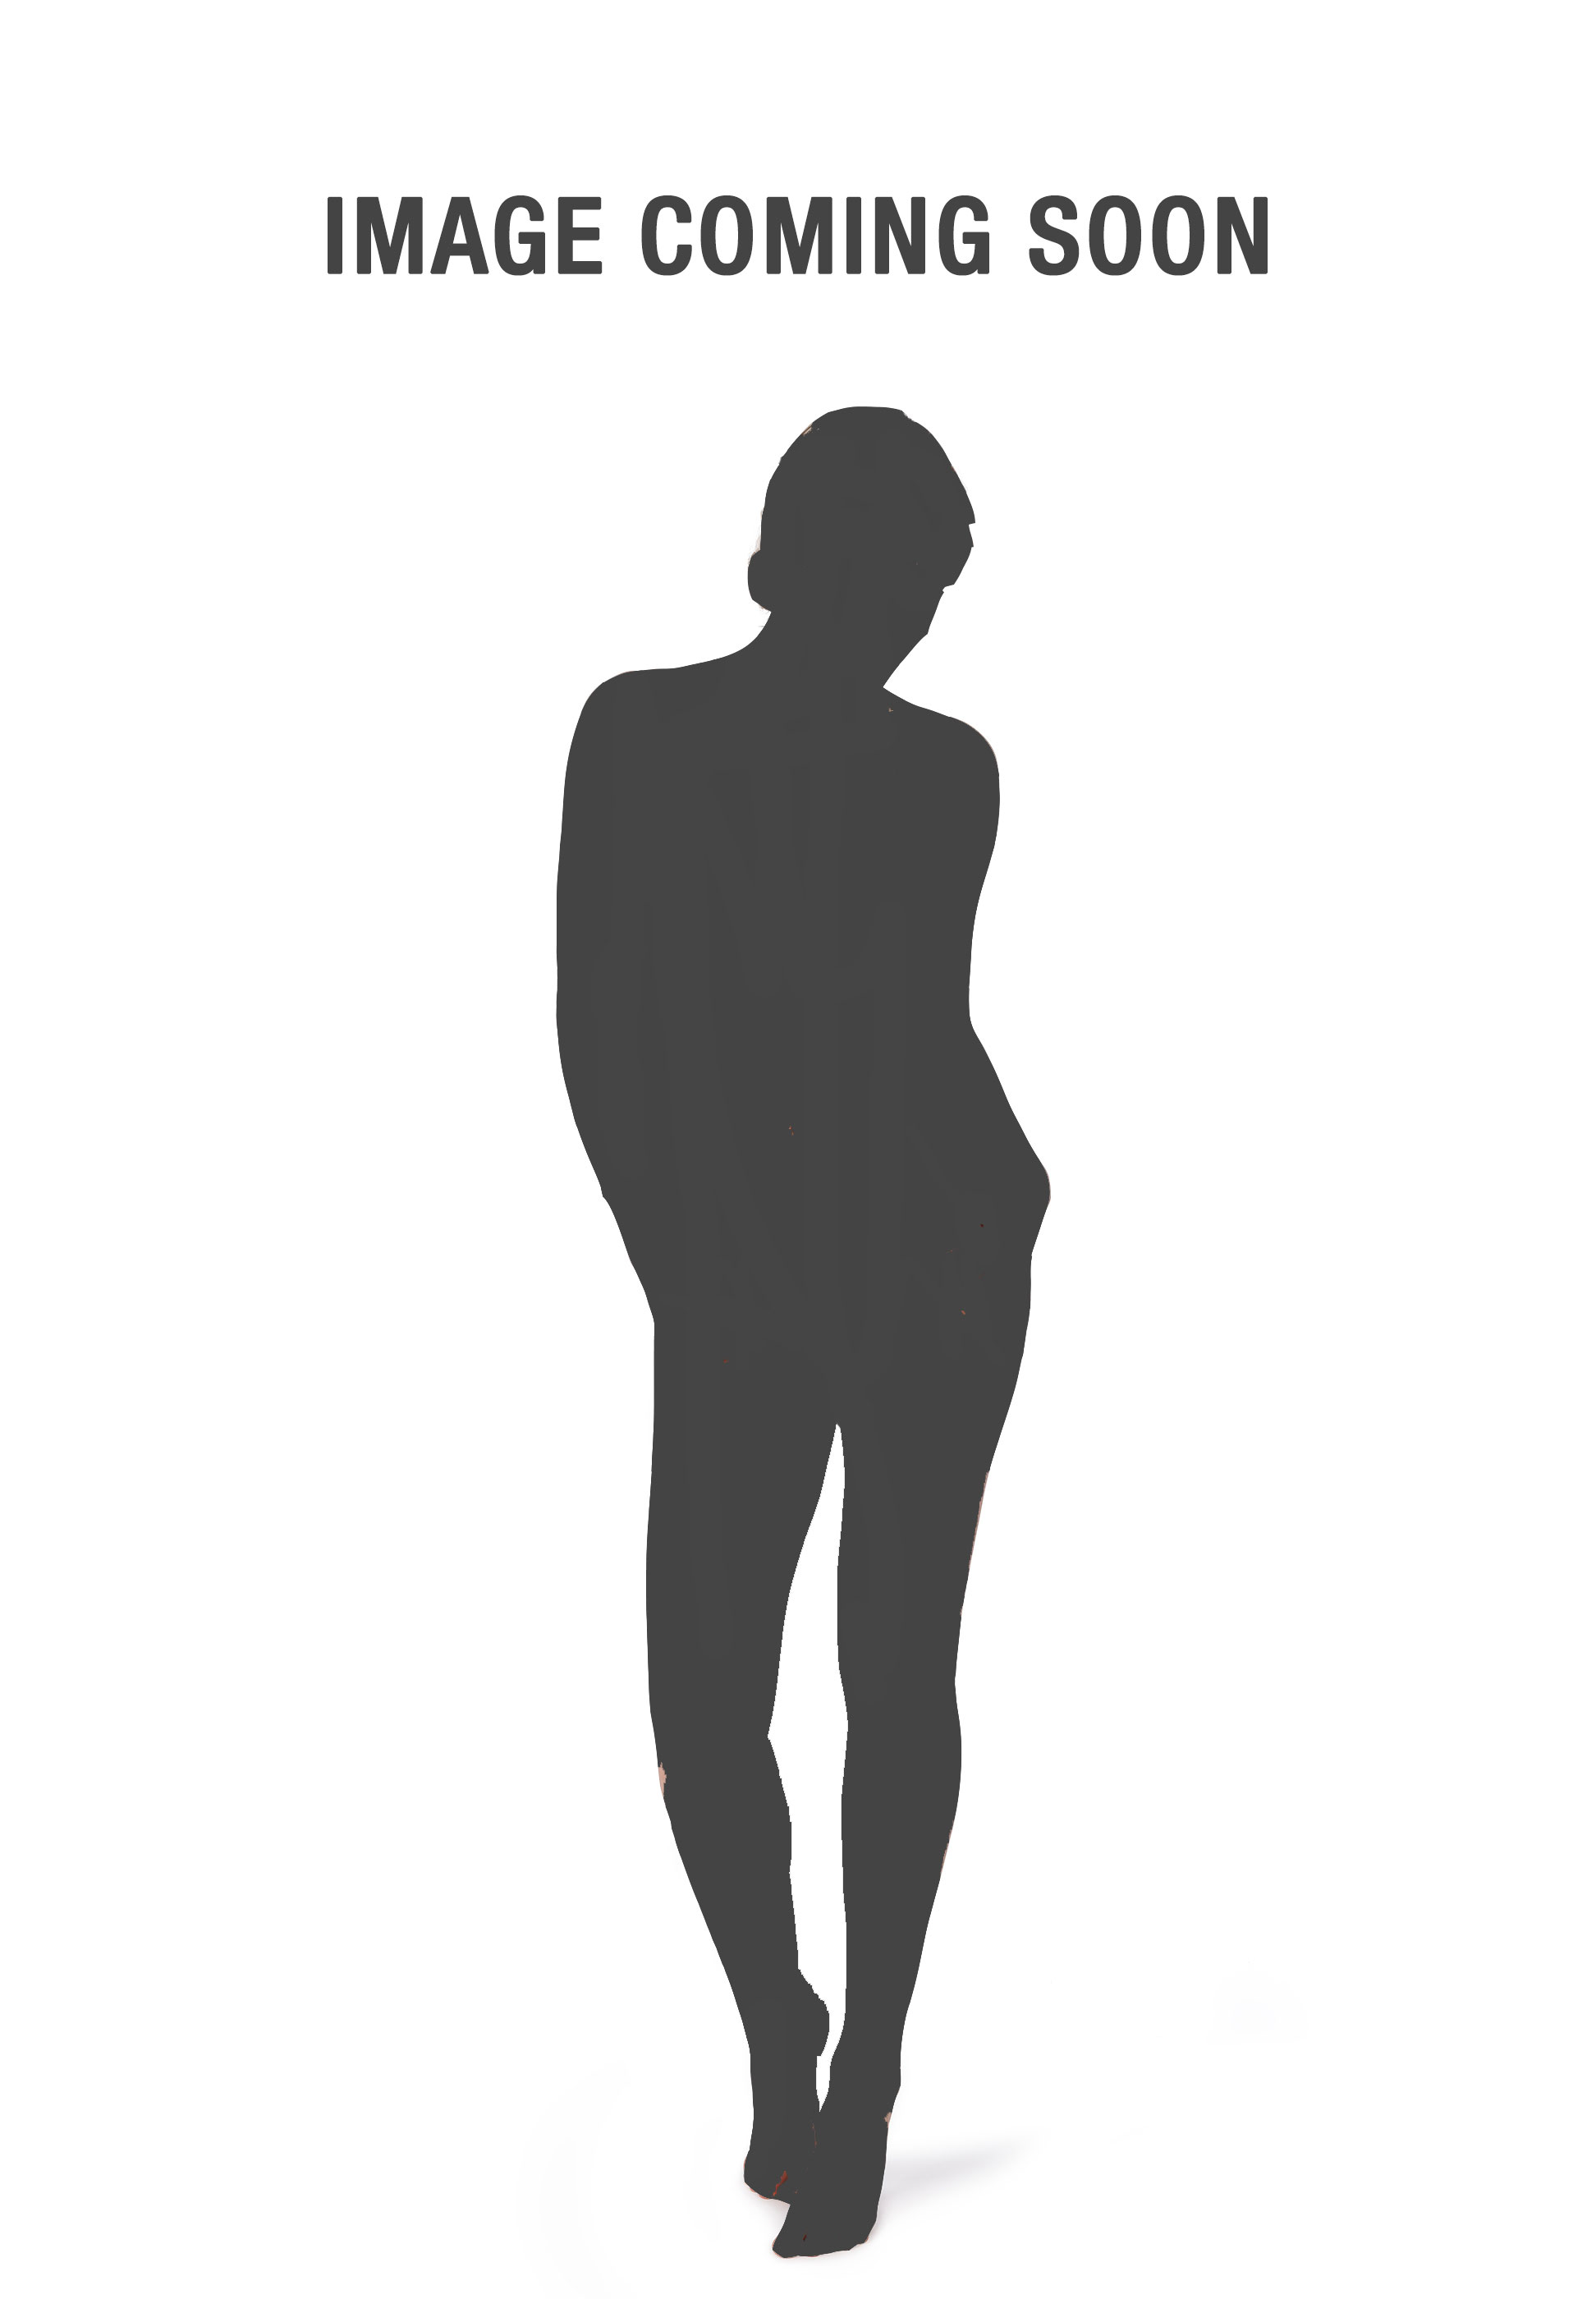 HUBER_Basic_W_BodyEssentials_body_016477_010636_060.jpg